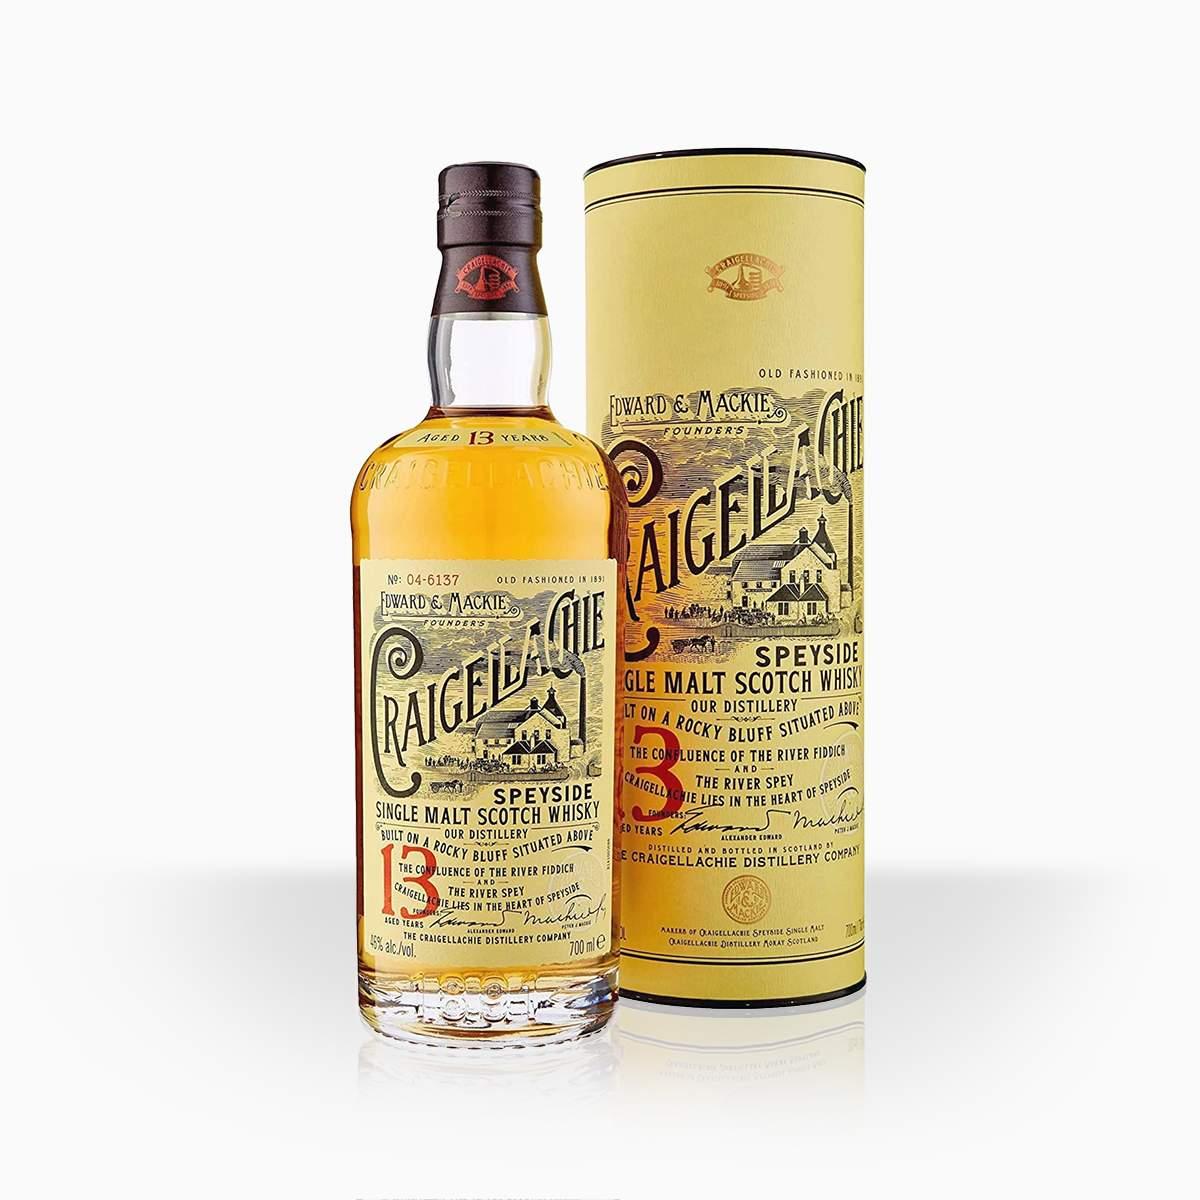 #2485 Whisky Craigellachie 13YO GB 46% 700ml